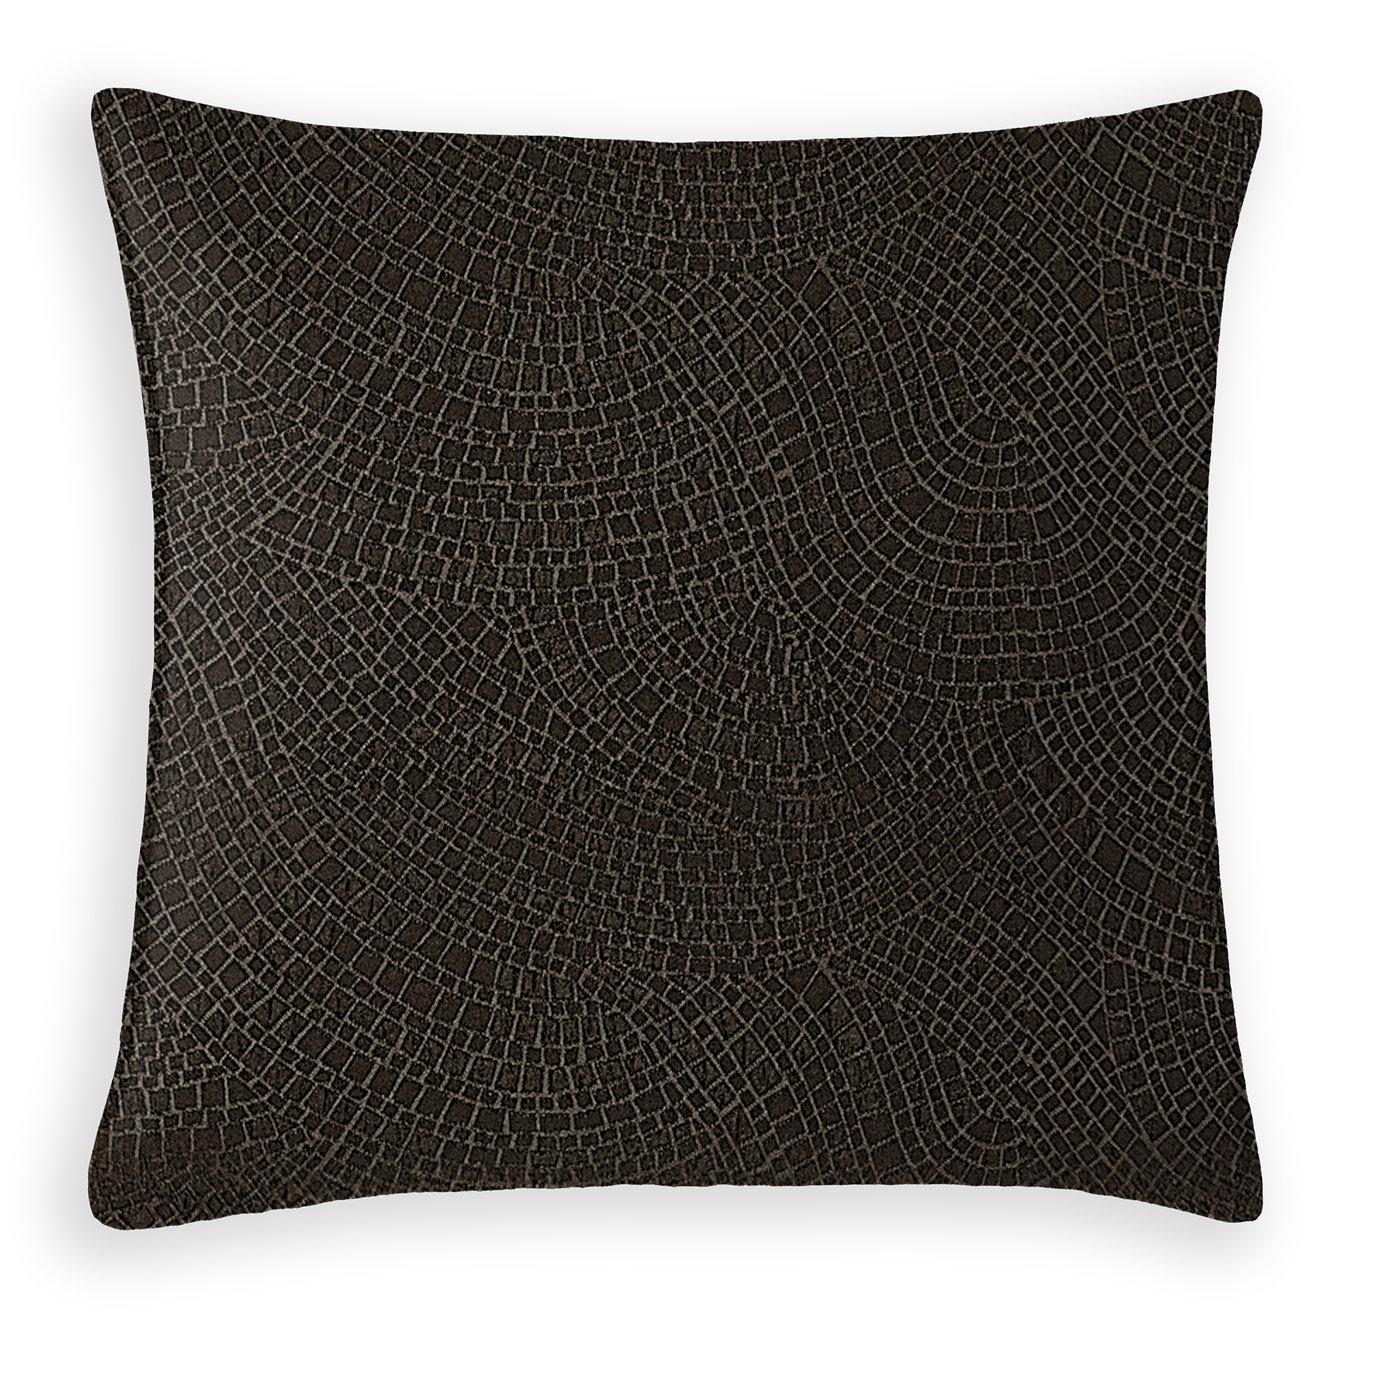 Hickory Lane Decorative Cushion - 20 Inch Square - Coordinating Velvet